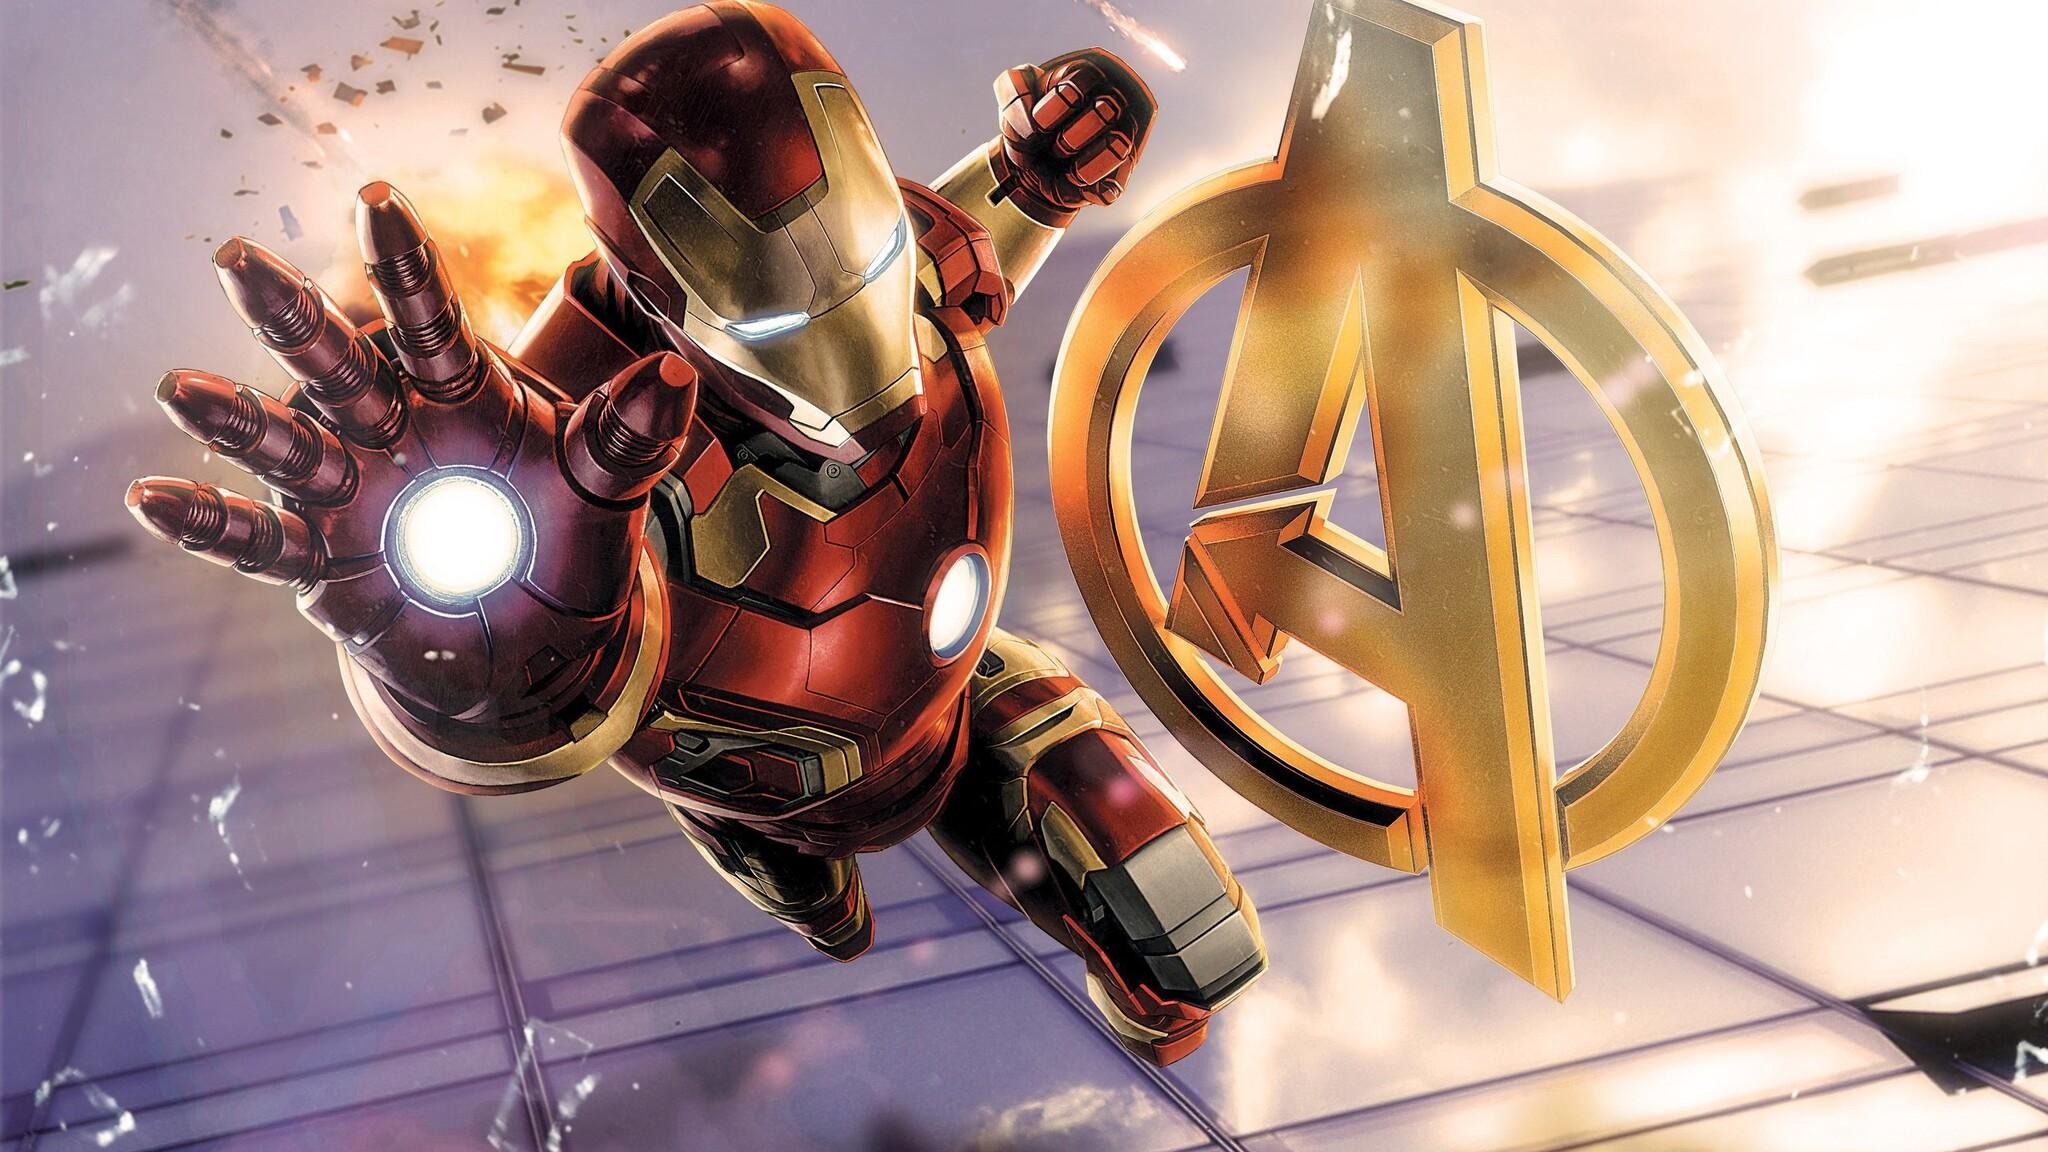 2048x1152 Iron Man Avengers 2048x1152 Resolution Hd 4k Wallpapers